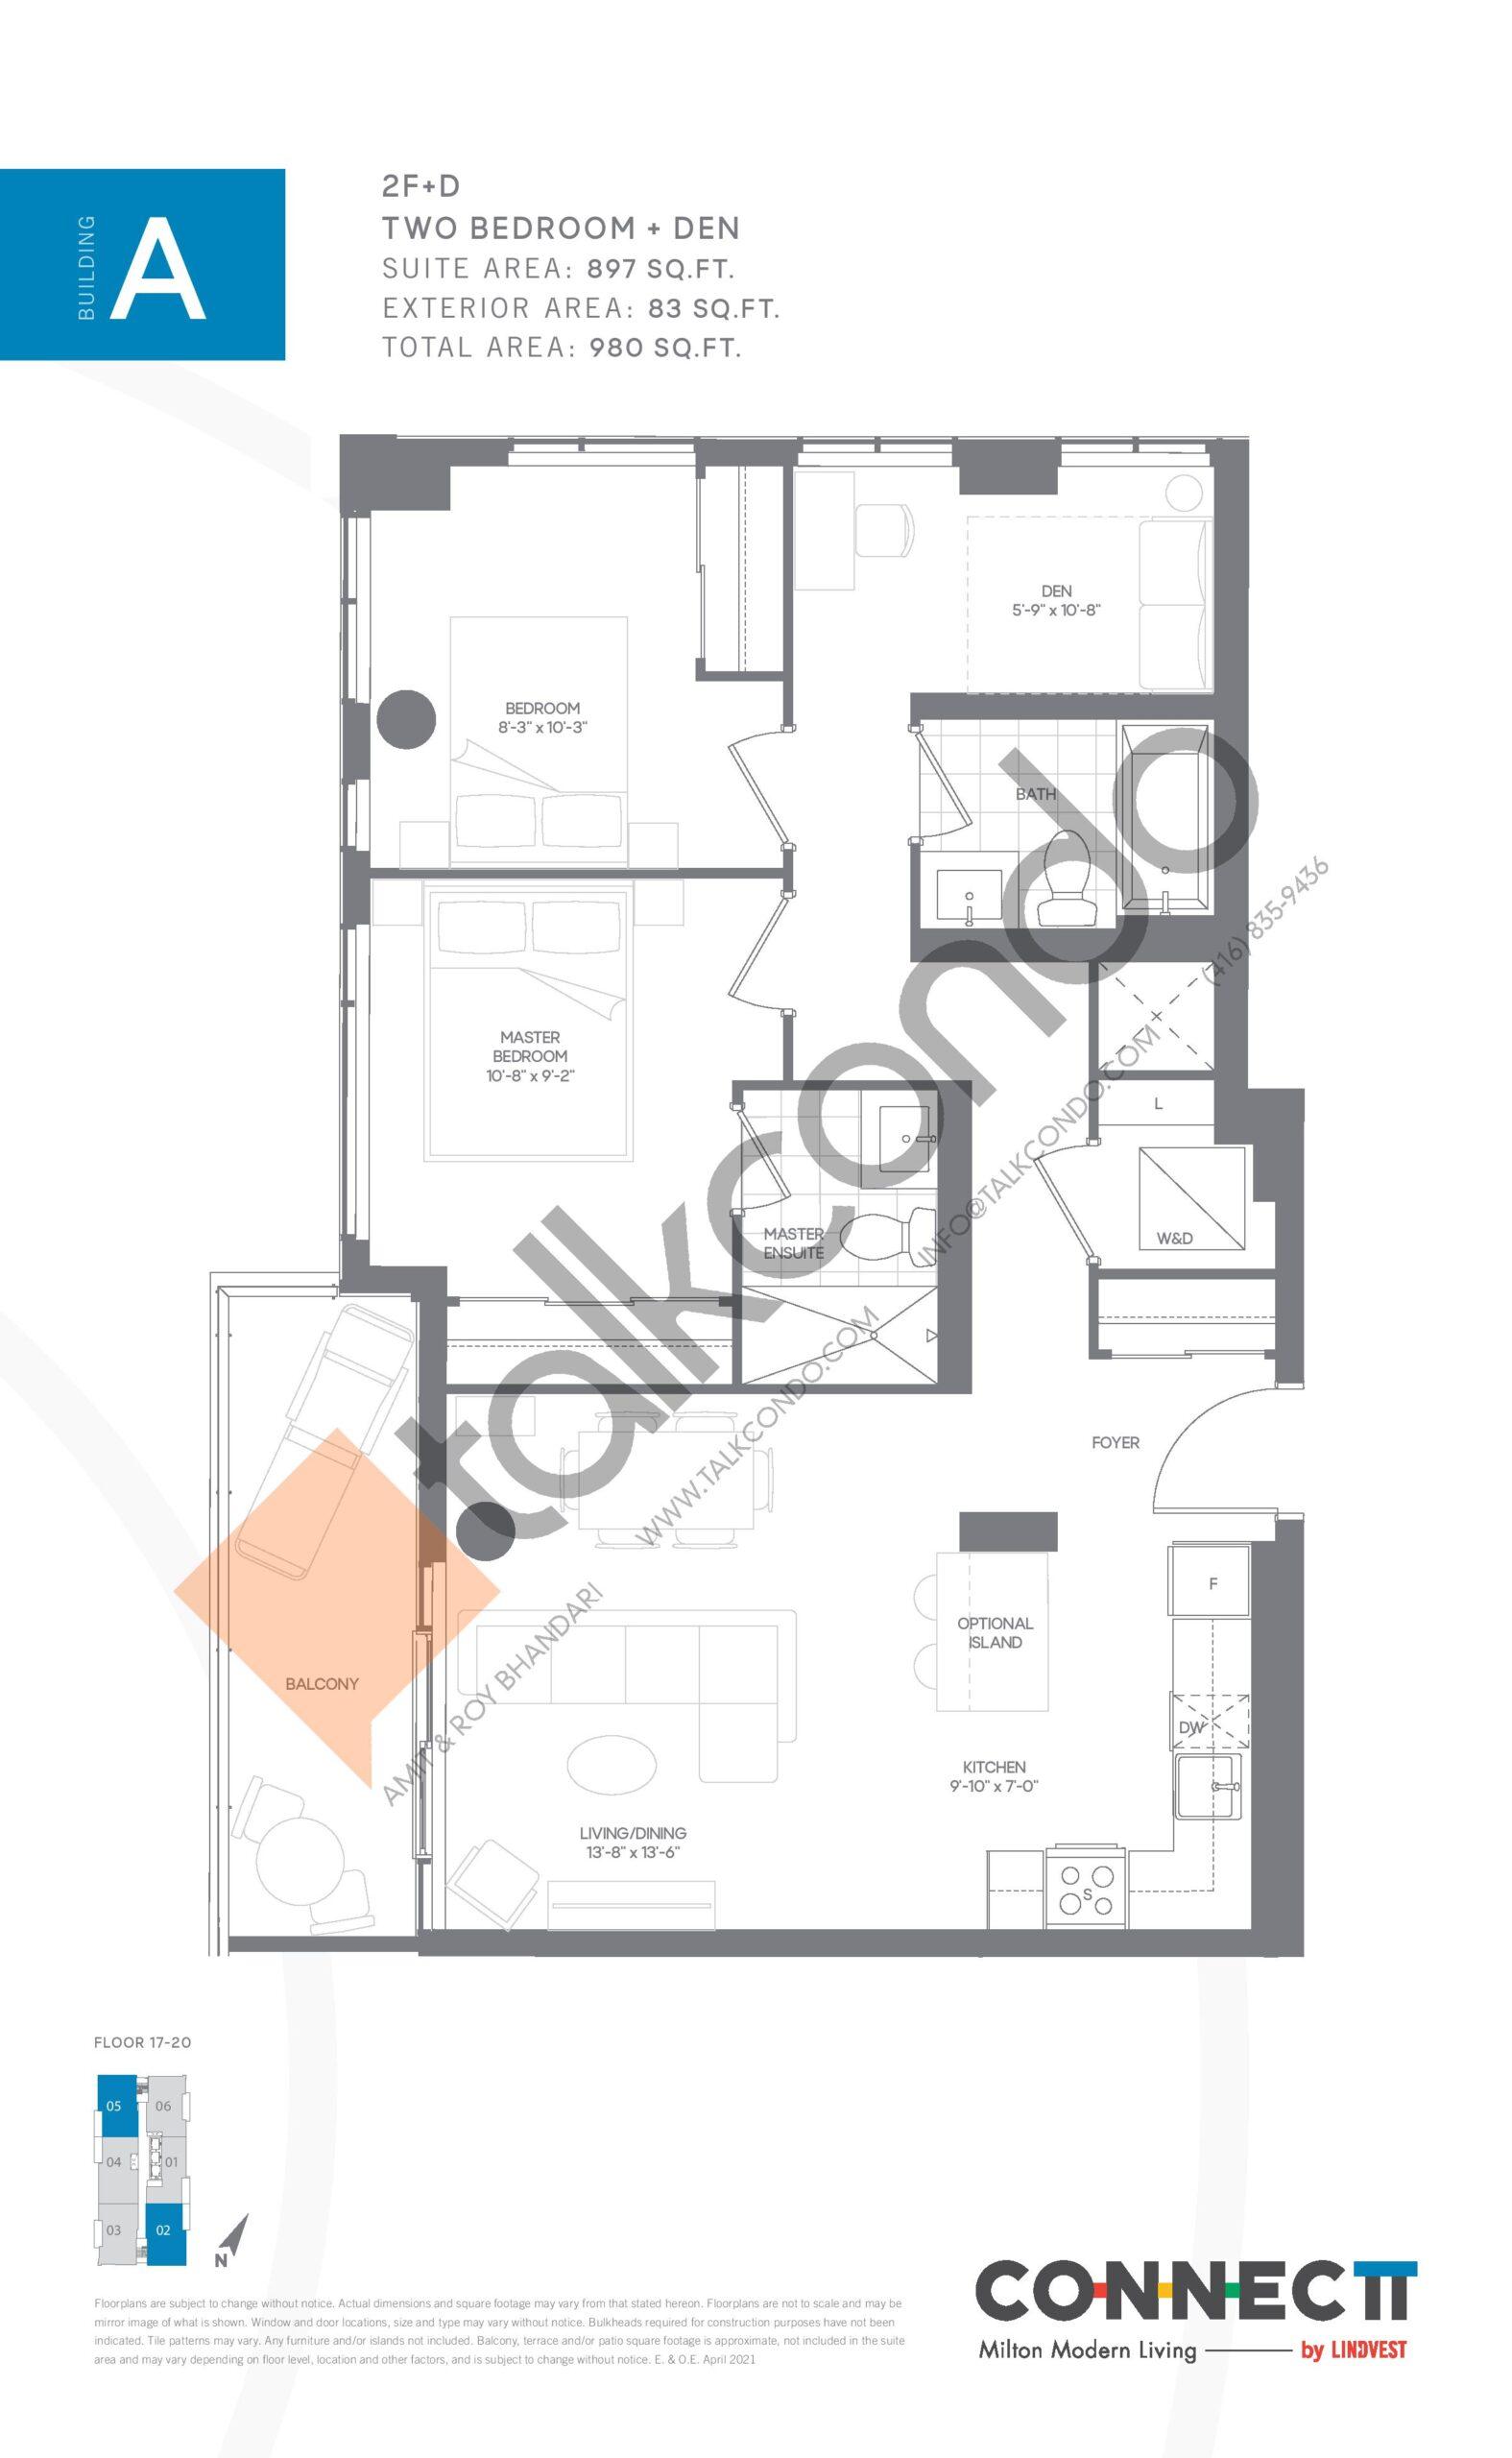 2F+D Floor Plan at Connectt Urban Community Condos - 897 sq.ft